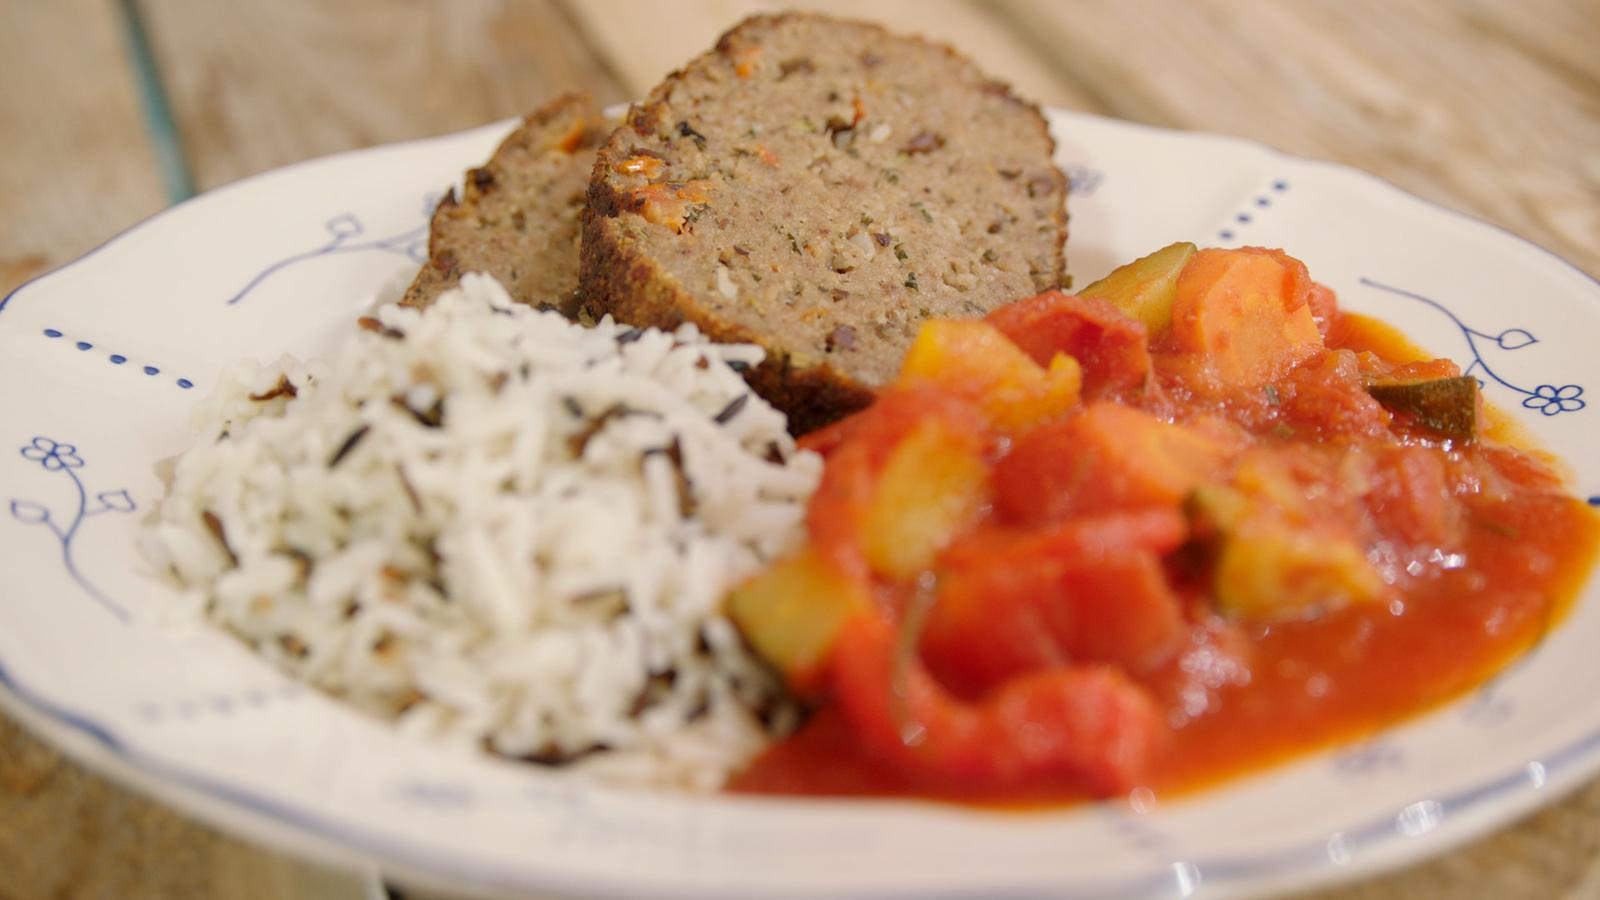 Gehaktbrood 'Provençale' met rijst